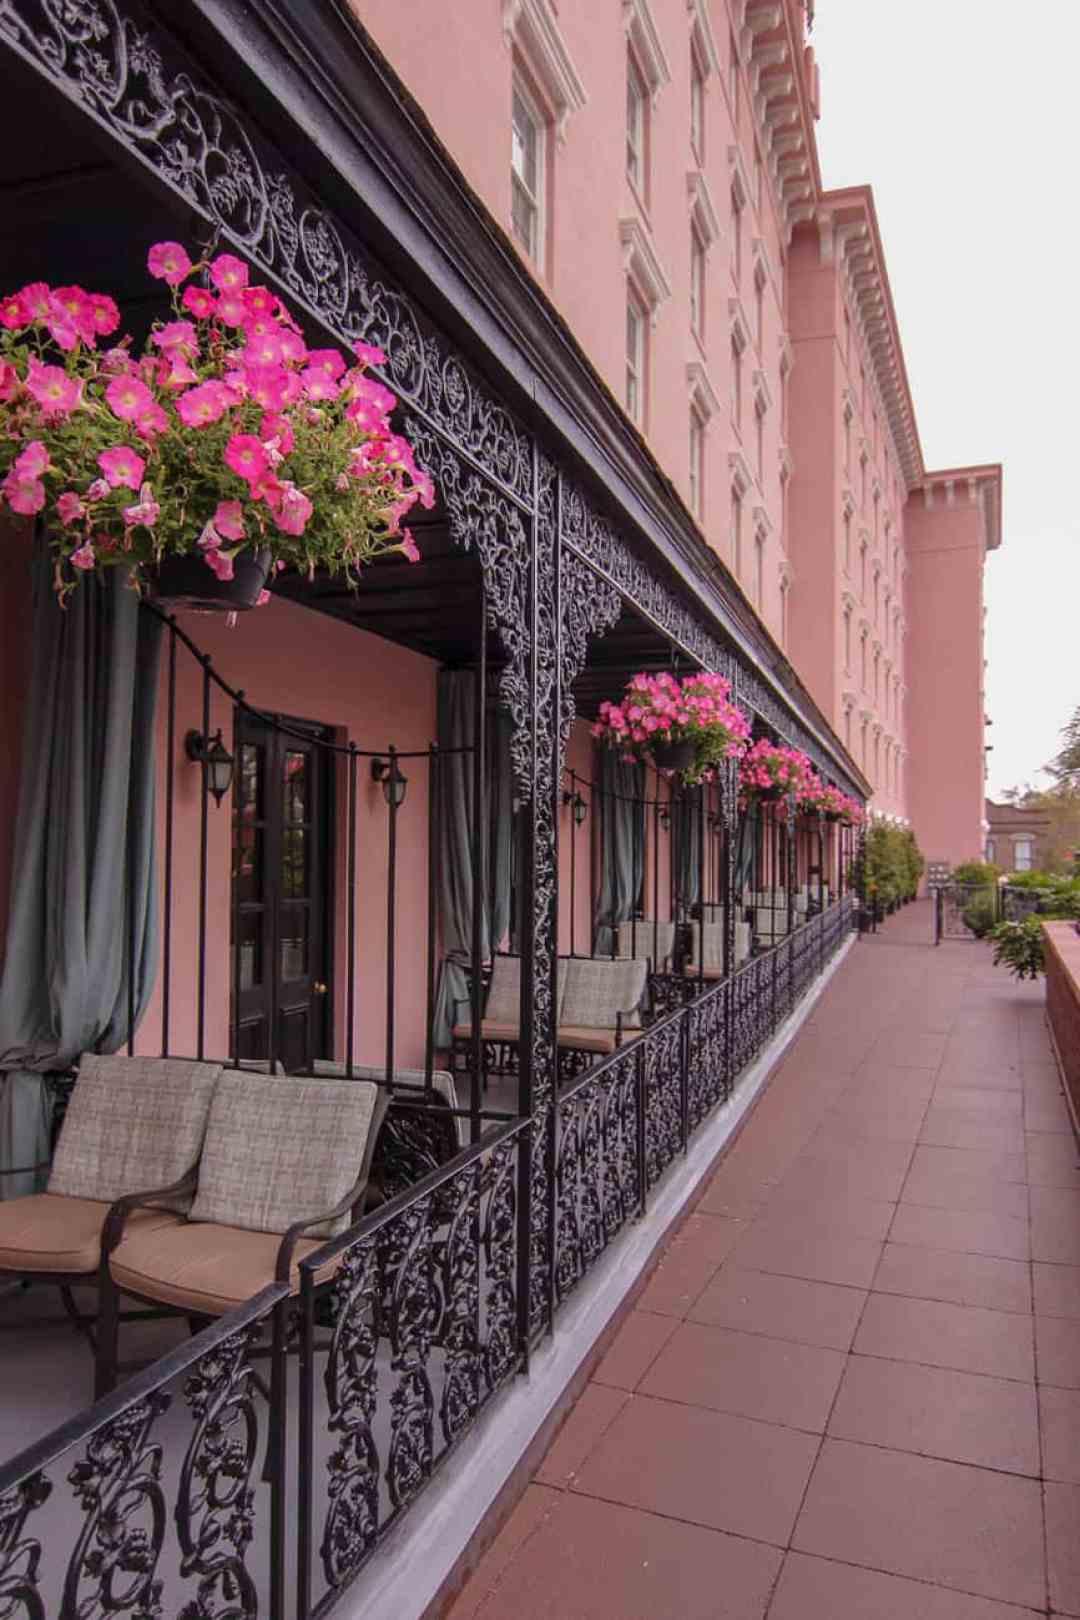 The Mills House Wyndham hotel in Charleston